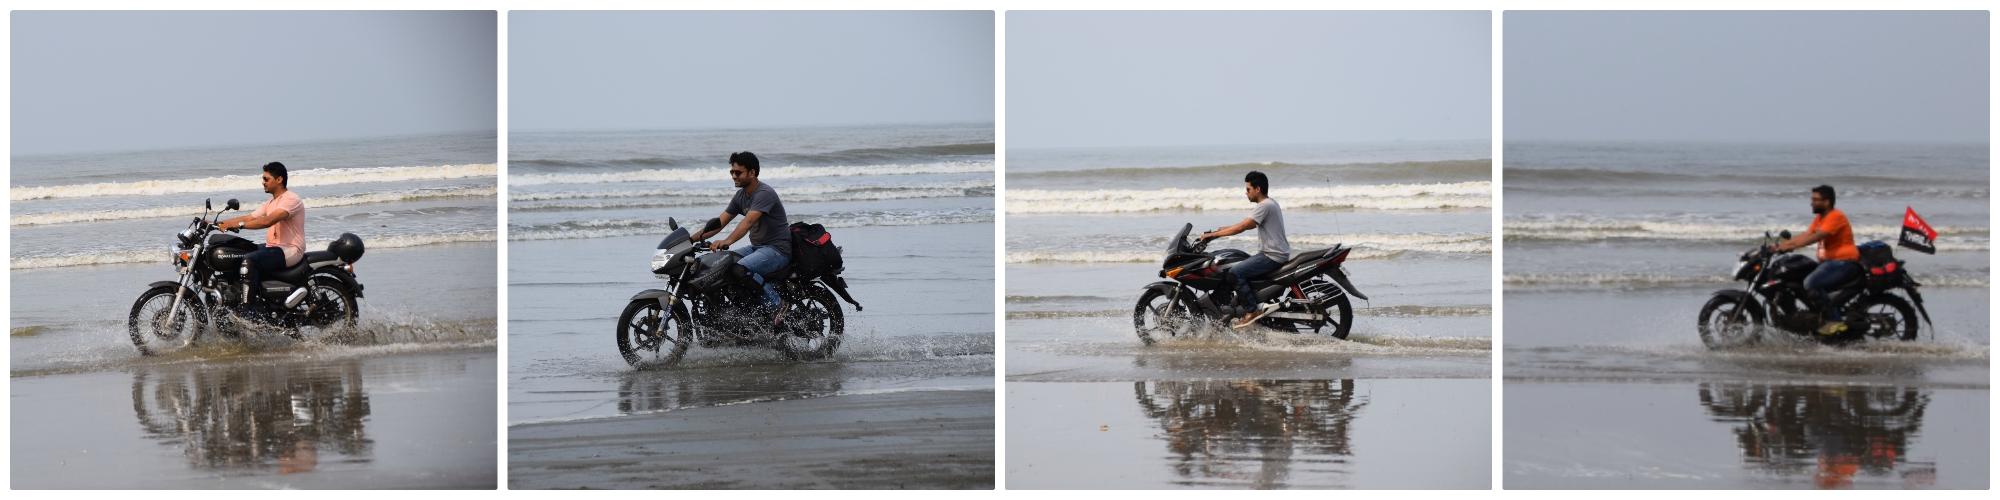 Muzzhappilangad Beach